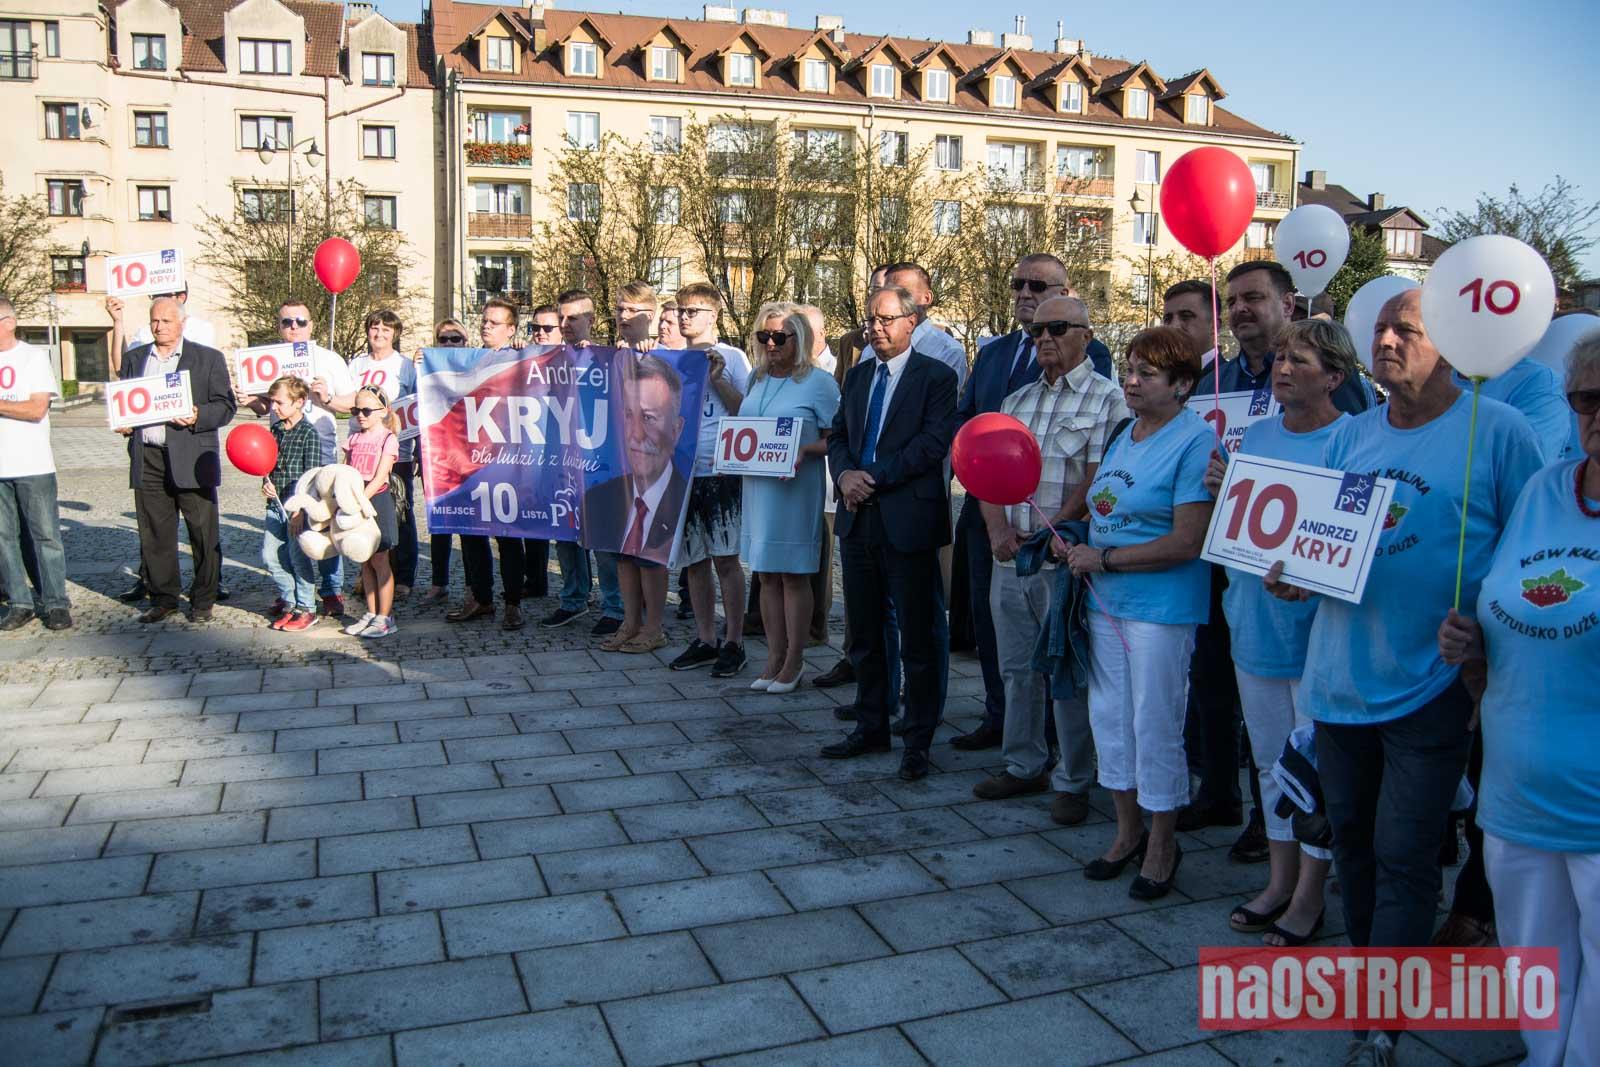 NaOSTRO Andrzej Kryj kampania-13